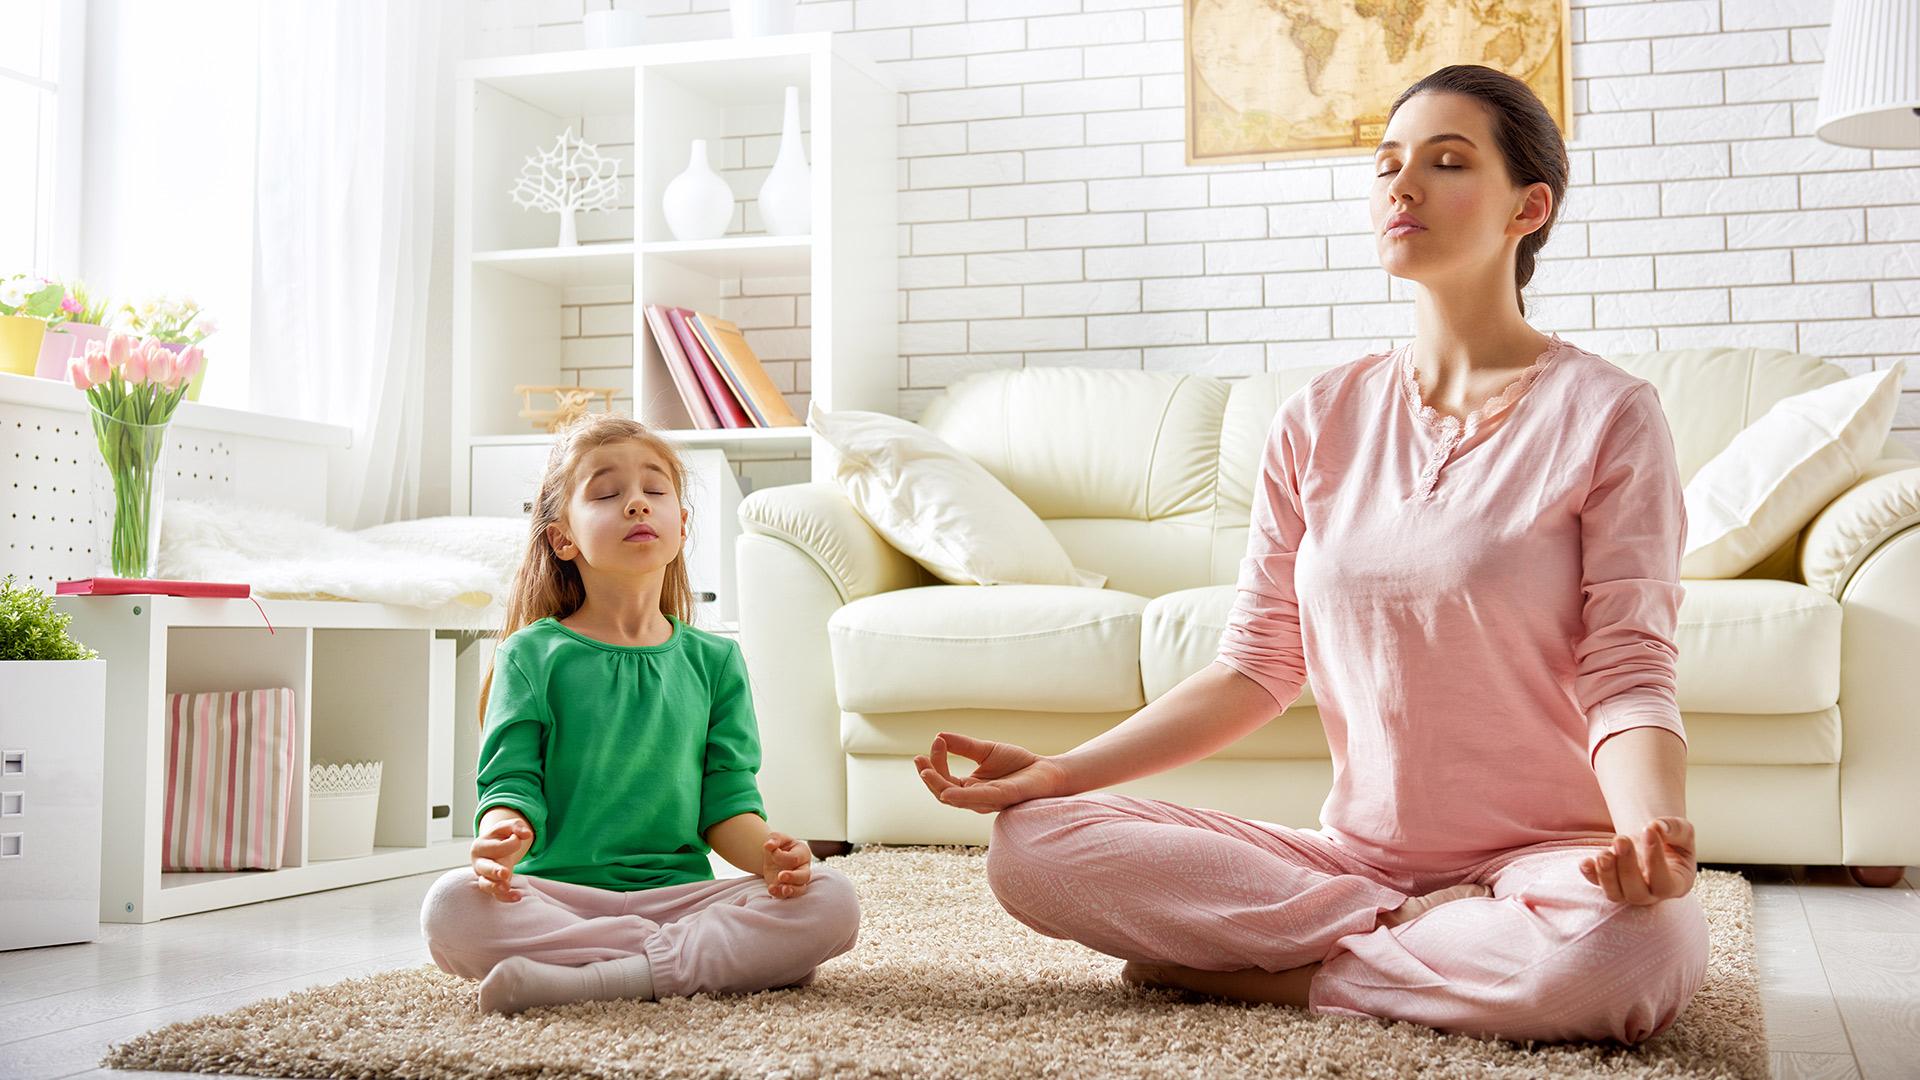 woman-practice-yoga-PHSH9GG